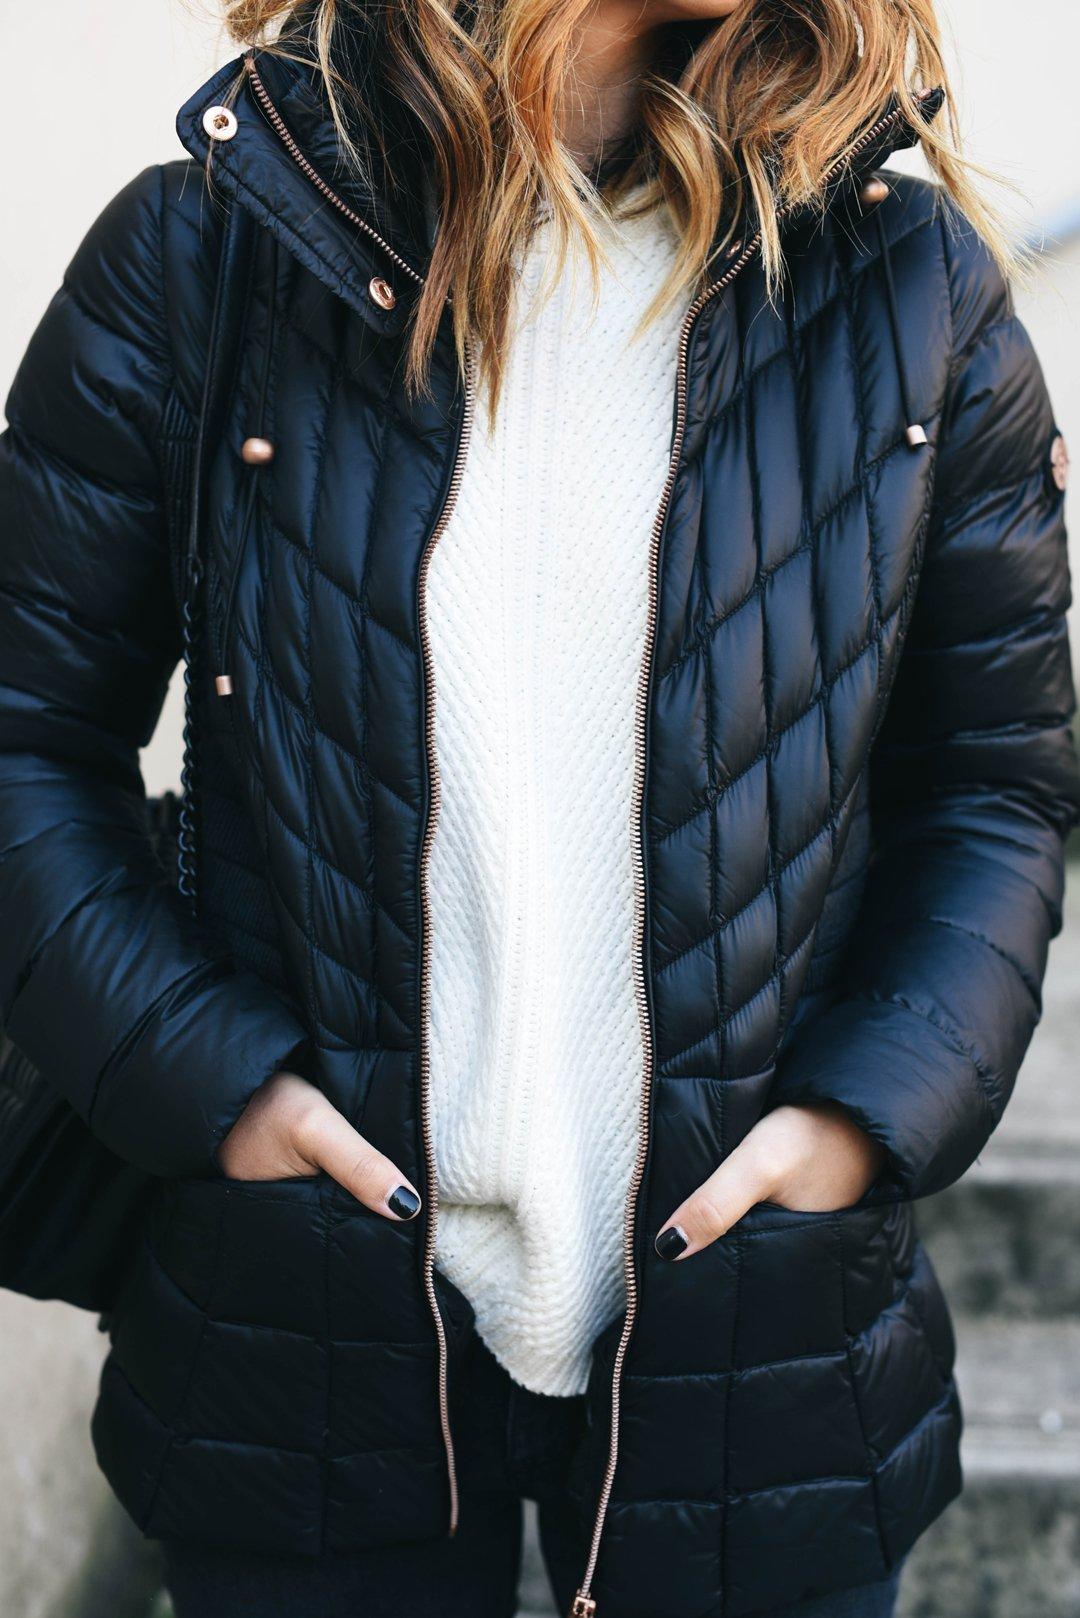 3428a9ed89361 ... crystalin-marie-wearing-bernardo-packable-jacket-with-down- ...